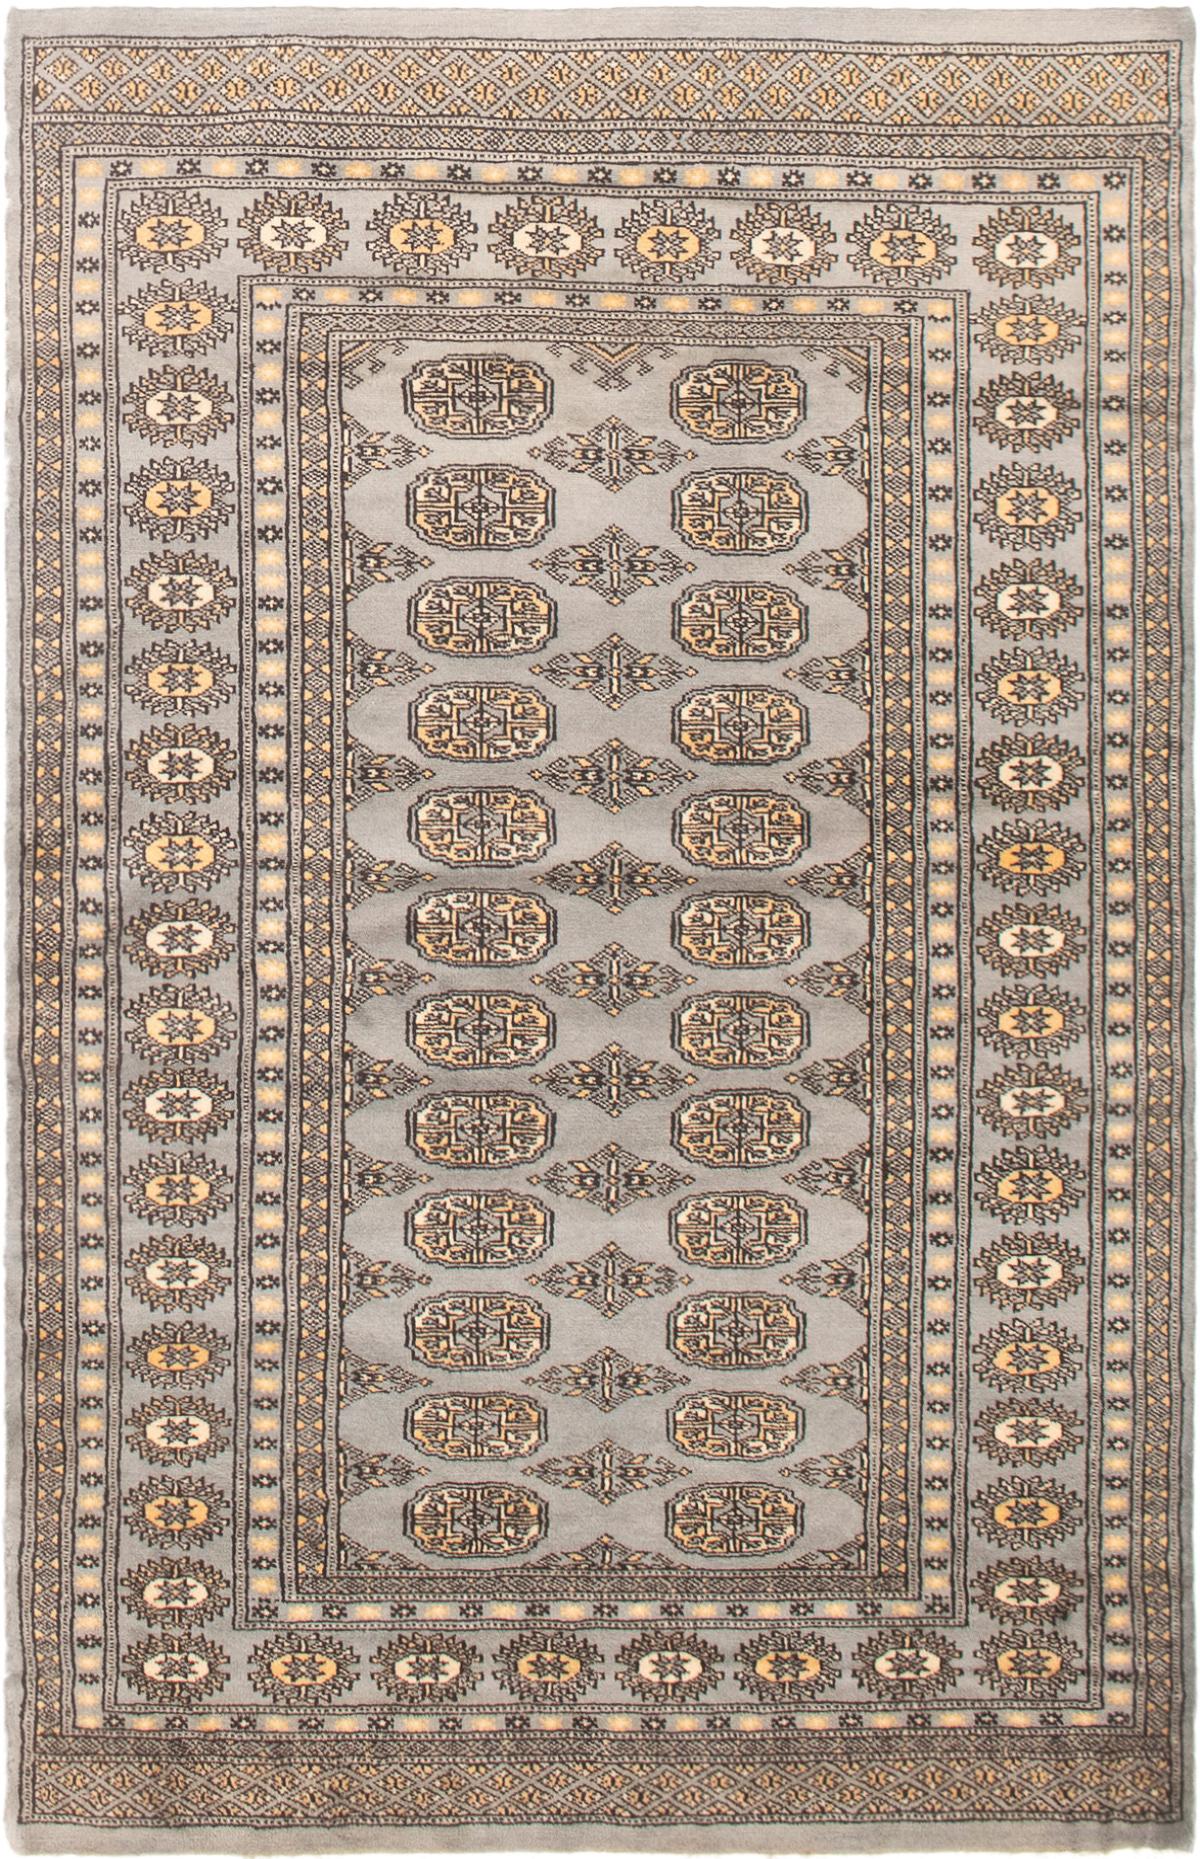 "Hand-knotted Finest Peshawar Bokhara Light Blue  Wool Rug 4'0"" x 6'3"" Size: 4'0"" x 6'3"""